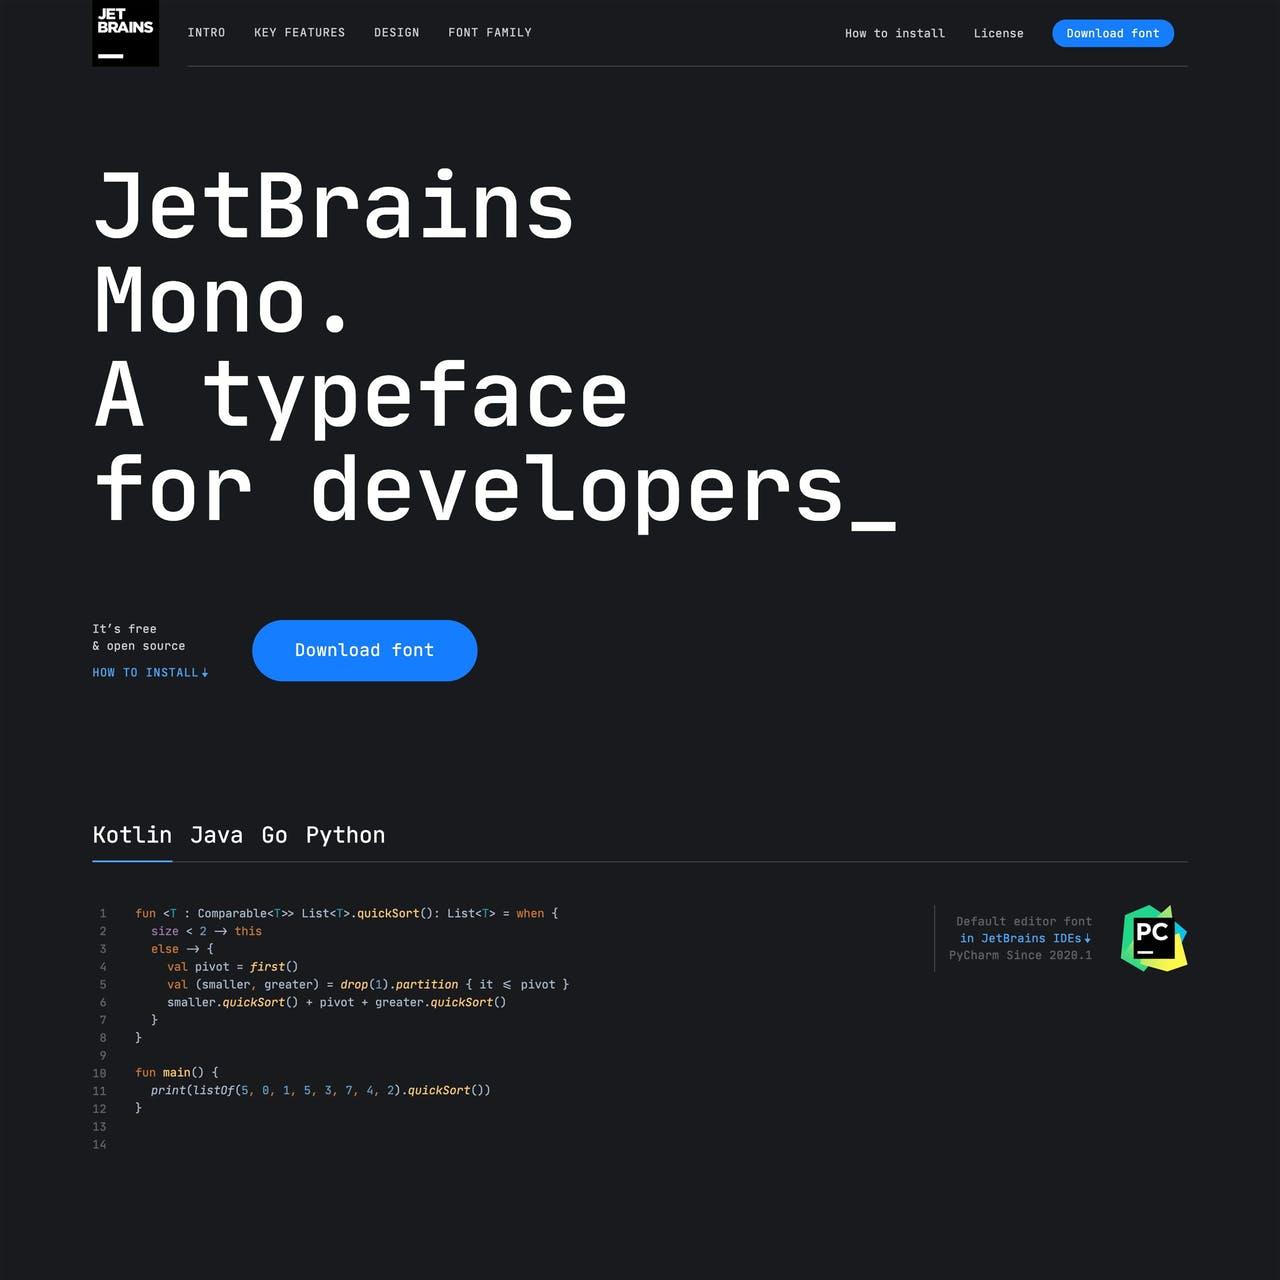 JetBrains Mono Website Screenshot